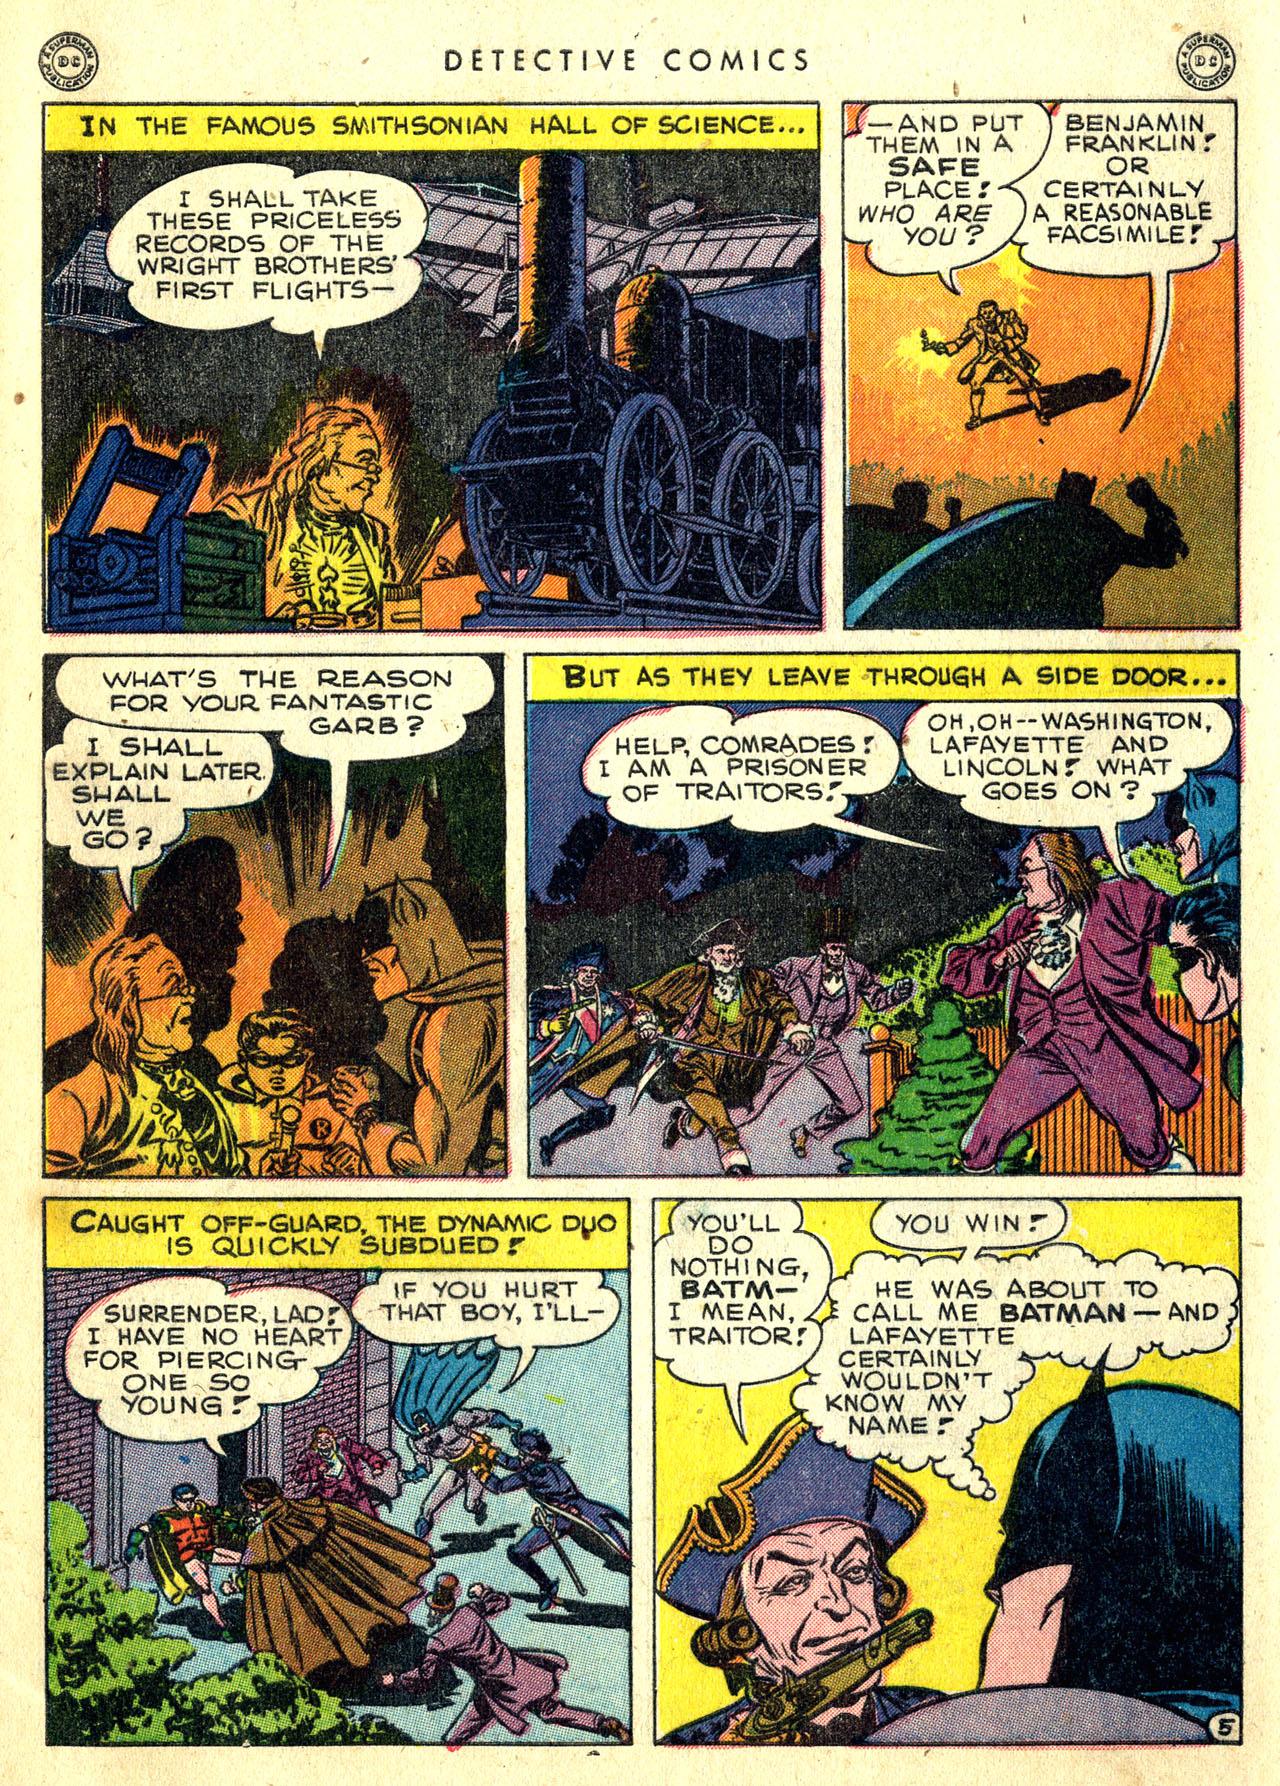 Detective Comics (1937) 119 Page 6